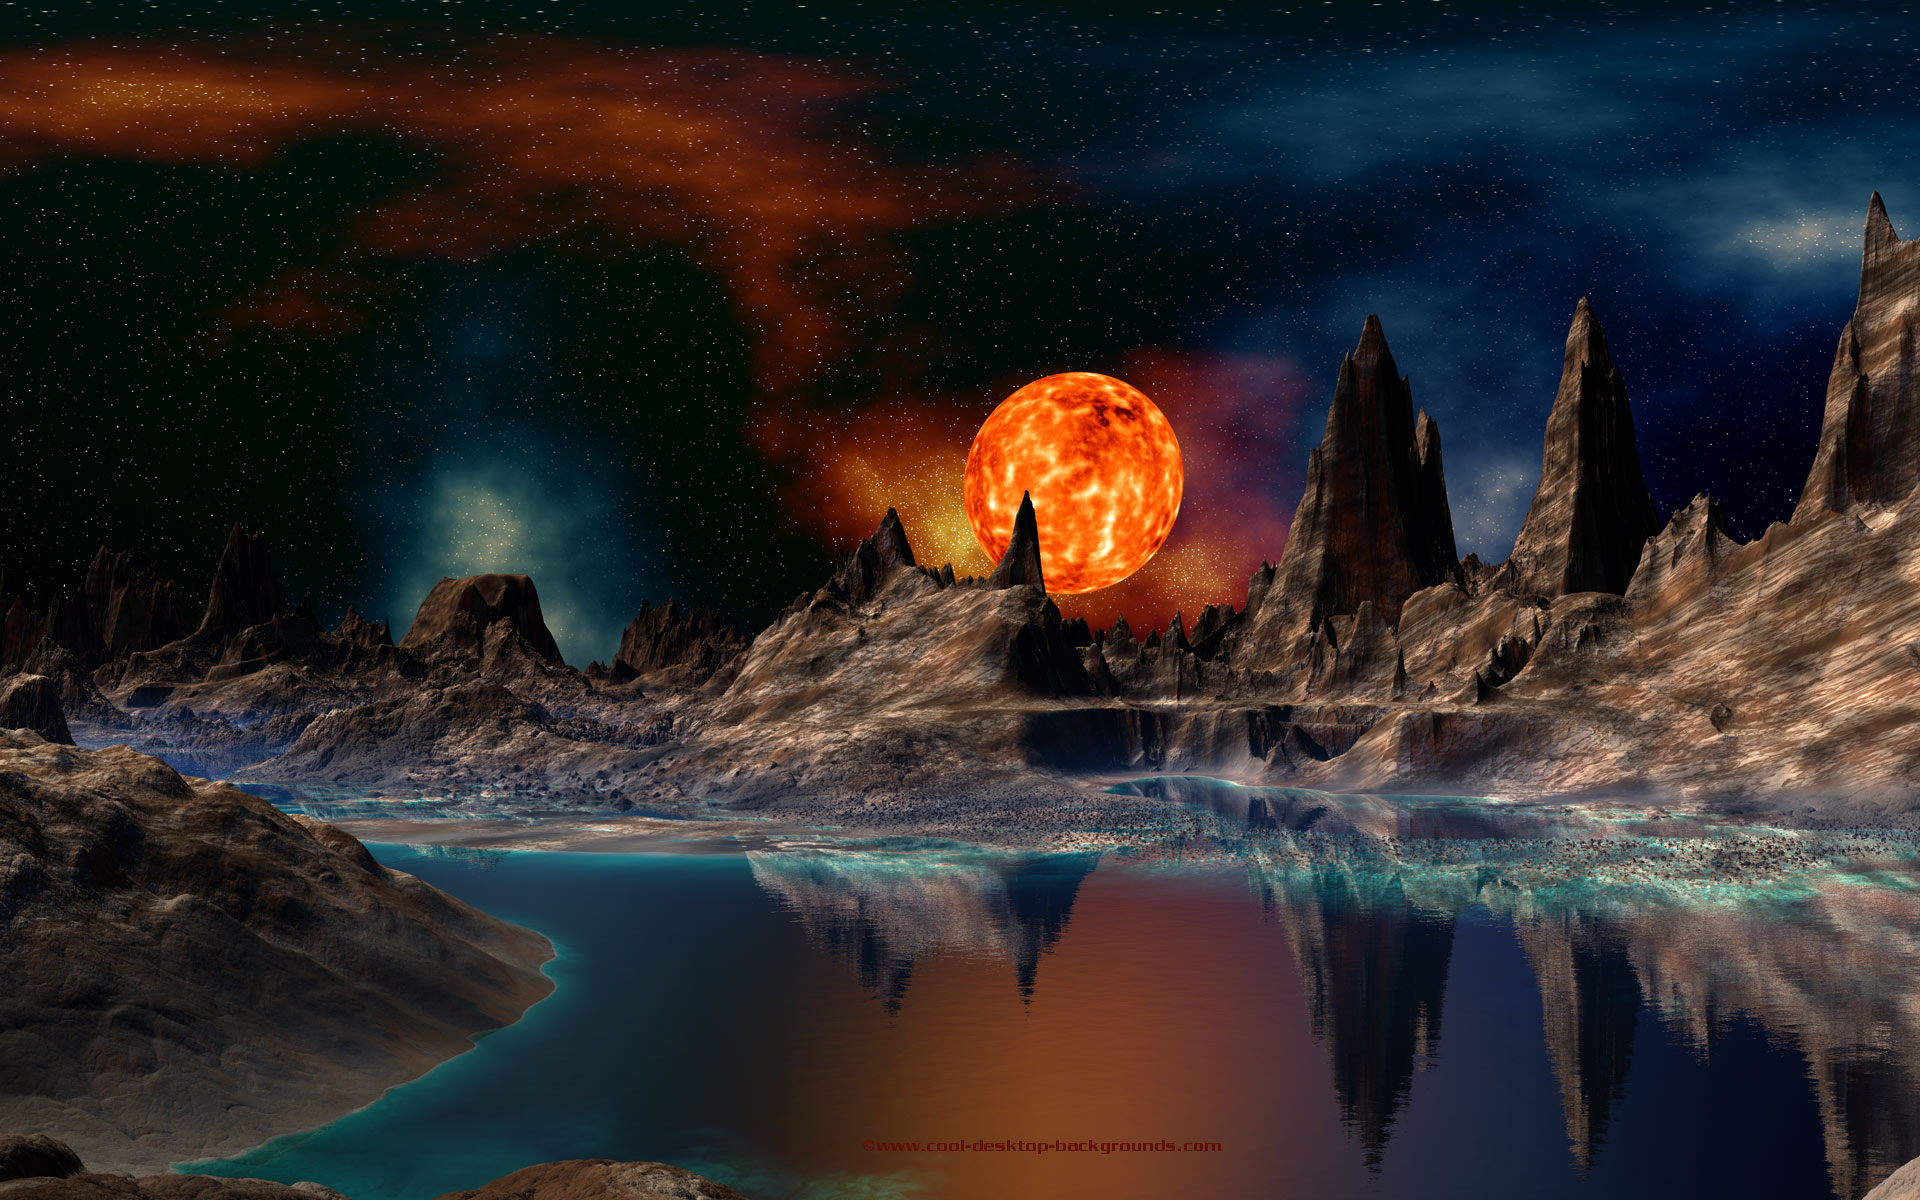 3d Space Background Wallpaper: 3D Space Desktop Wallpaper